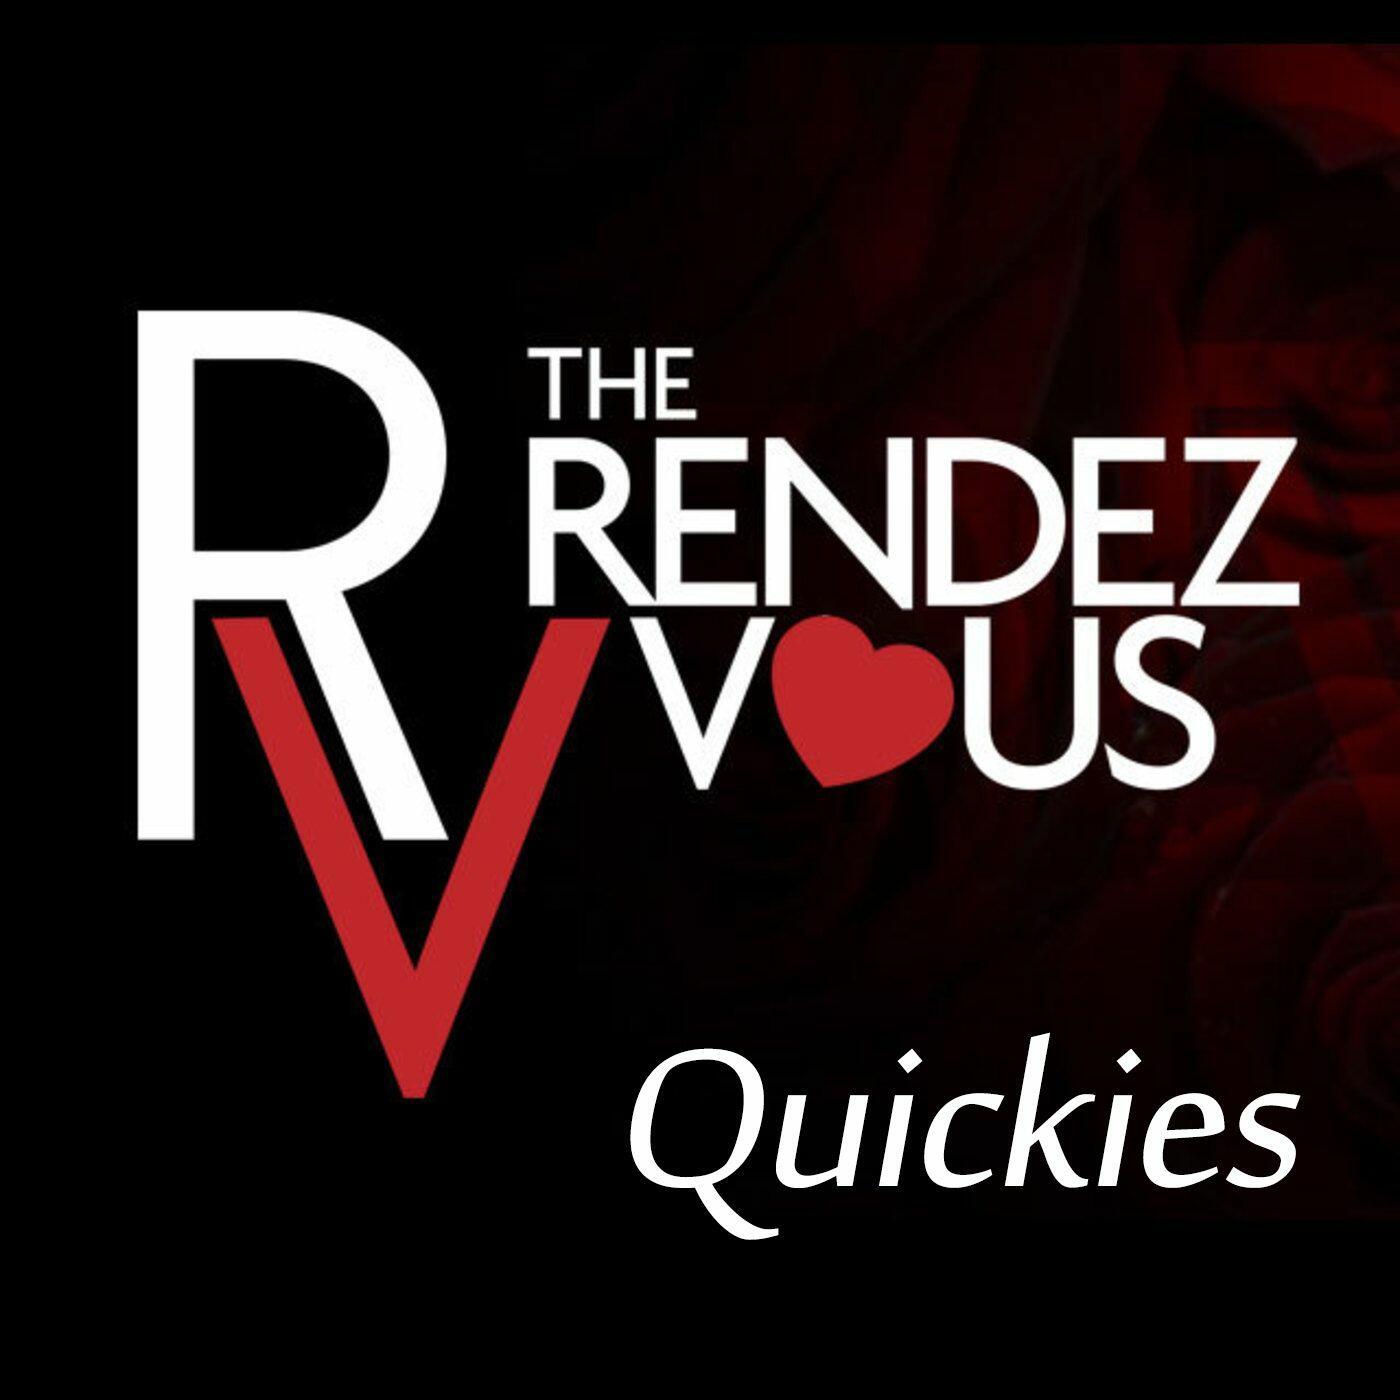 Rendezvous Quickies